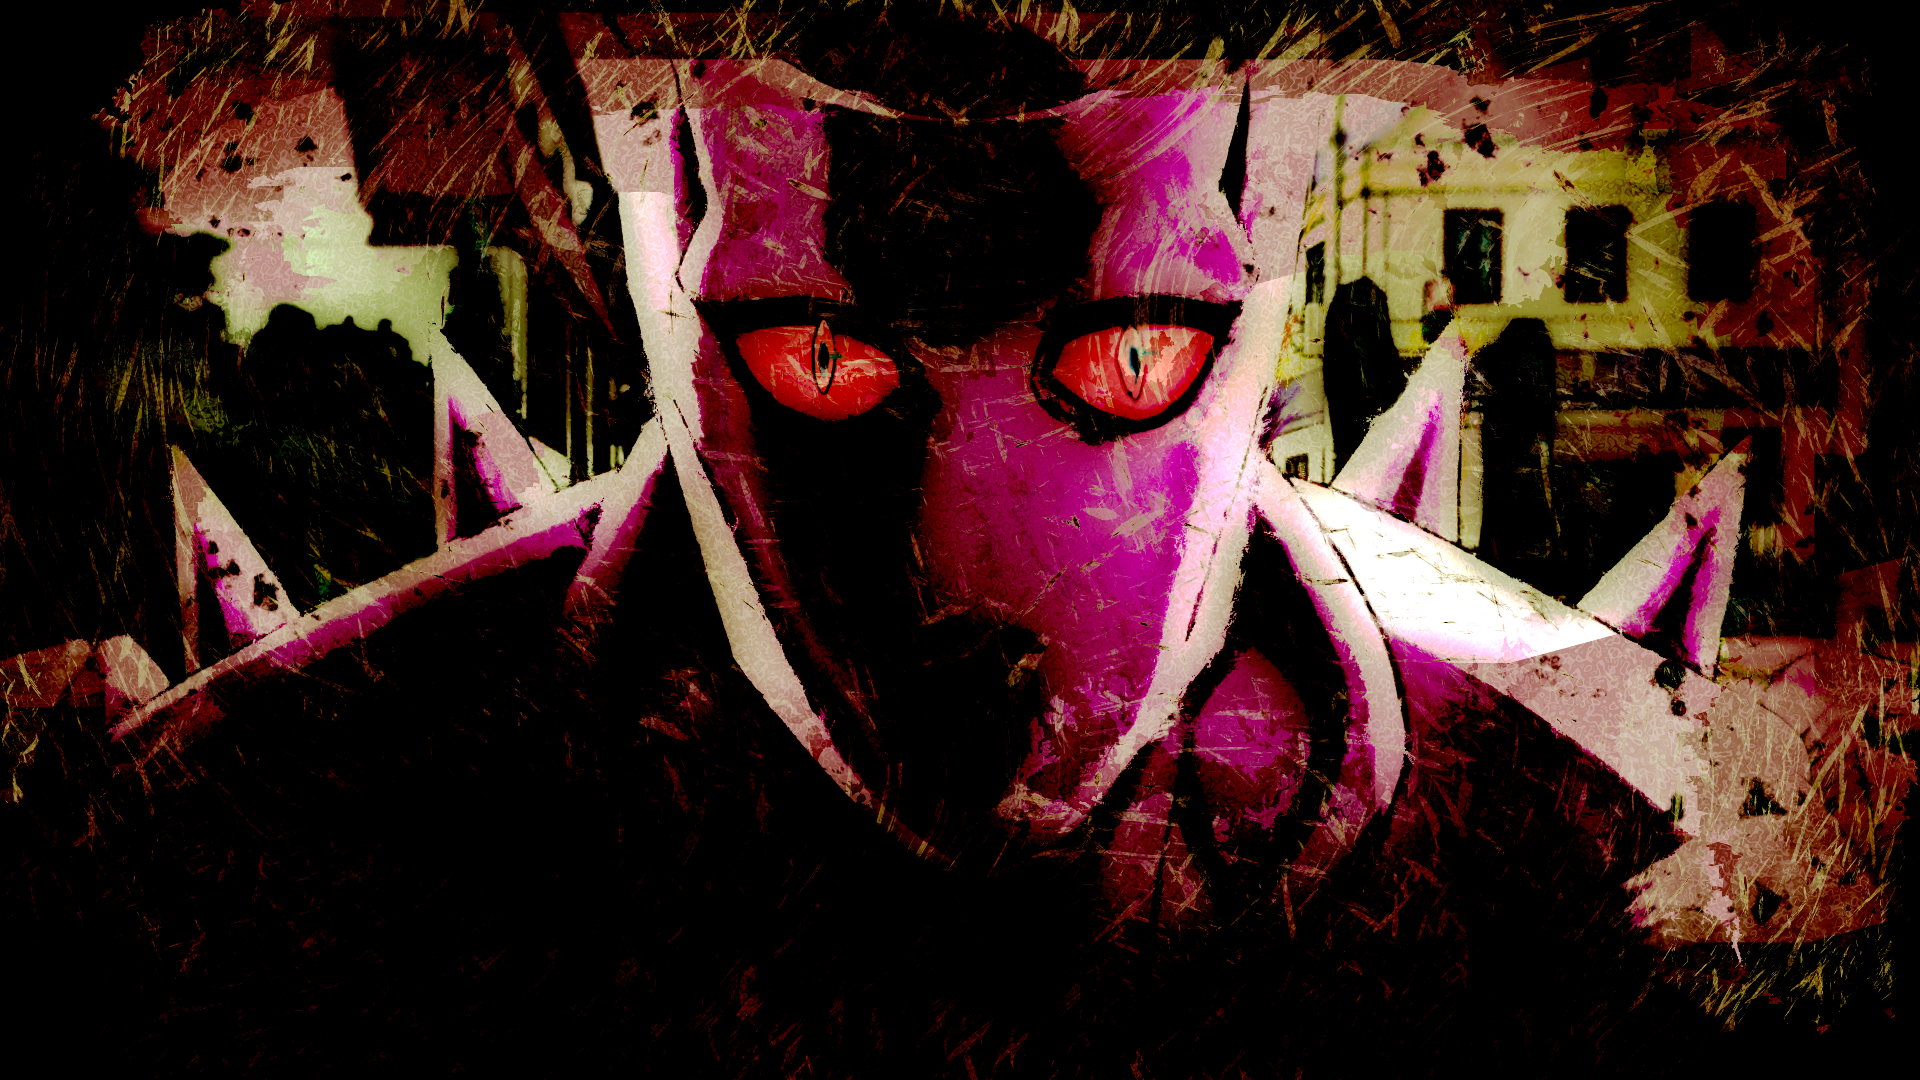 Jojo S Bizarre Adventure Hd Wallpaper Background Image